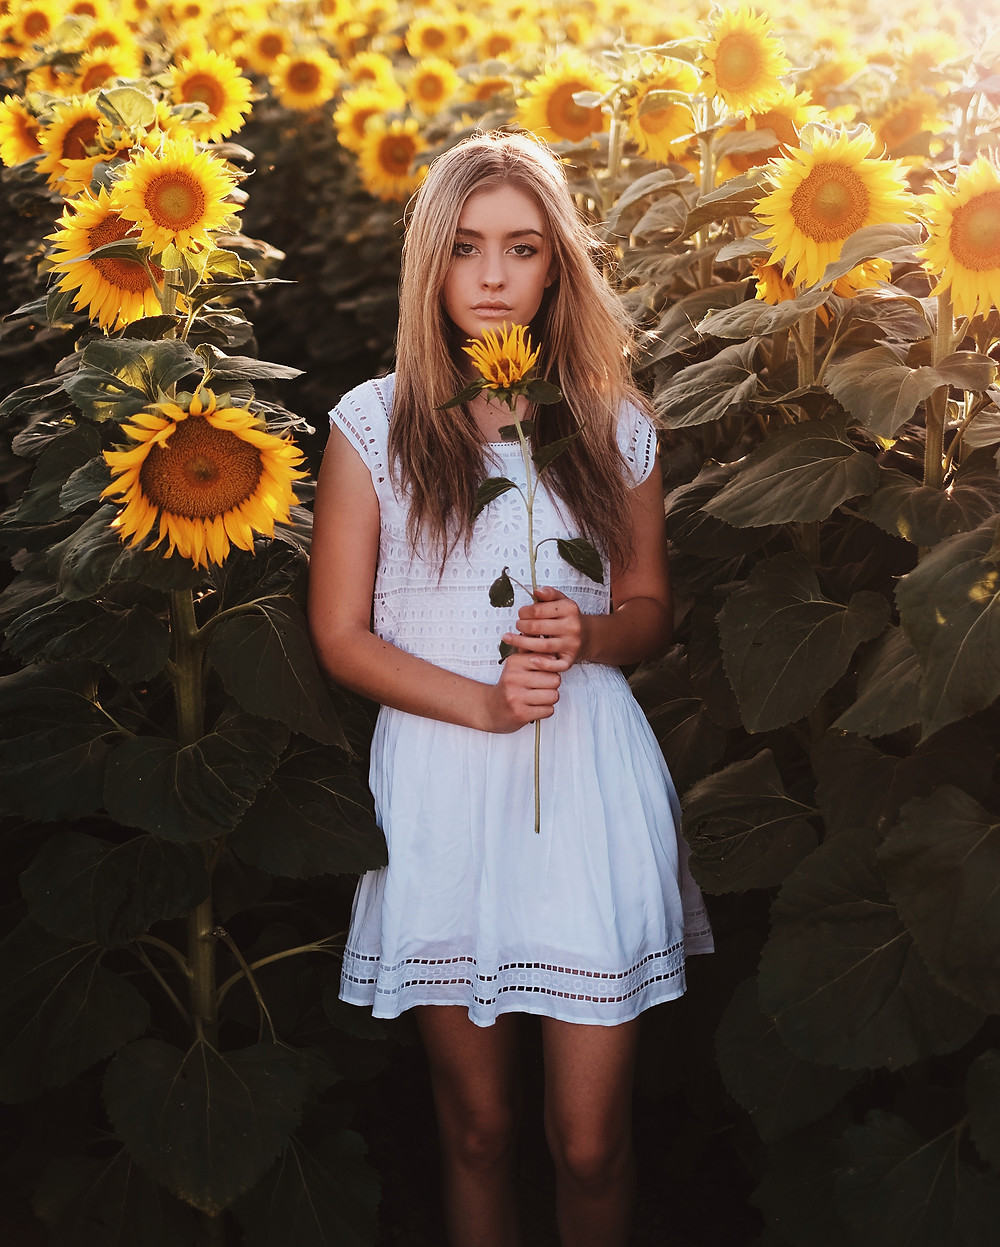 sunflowers backlight